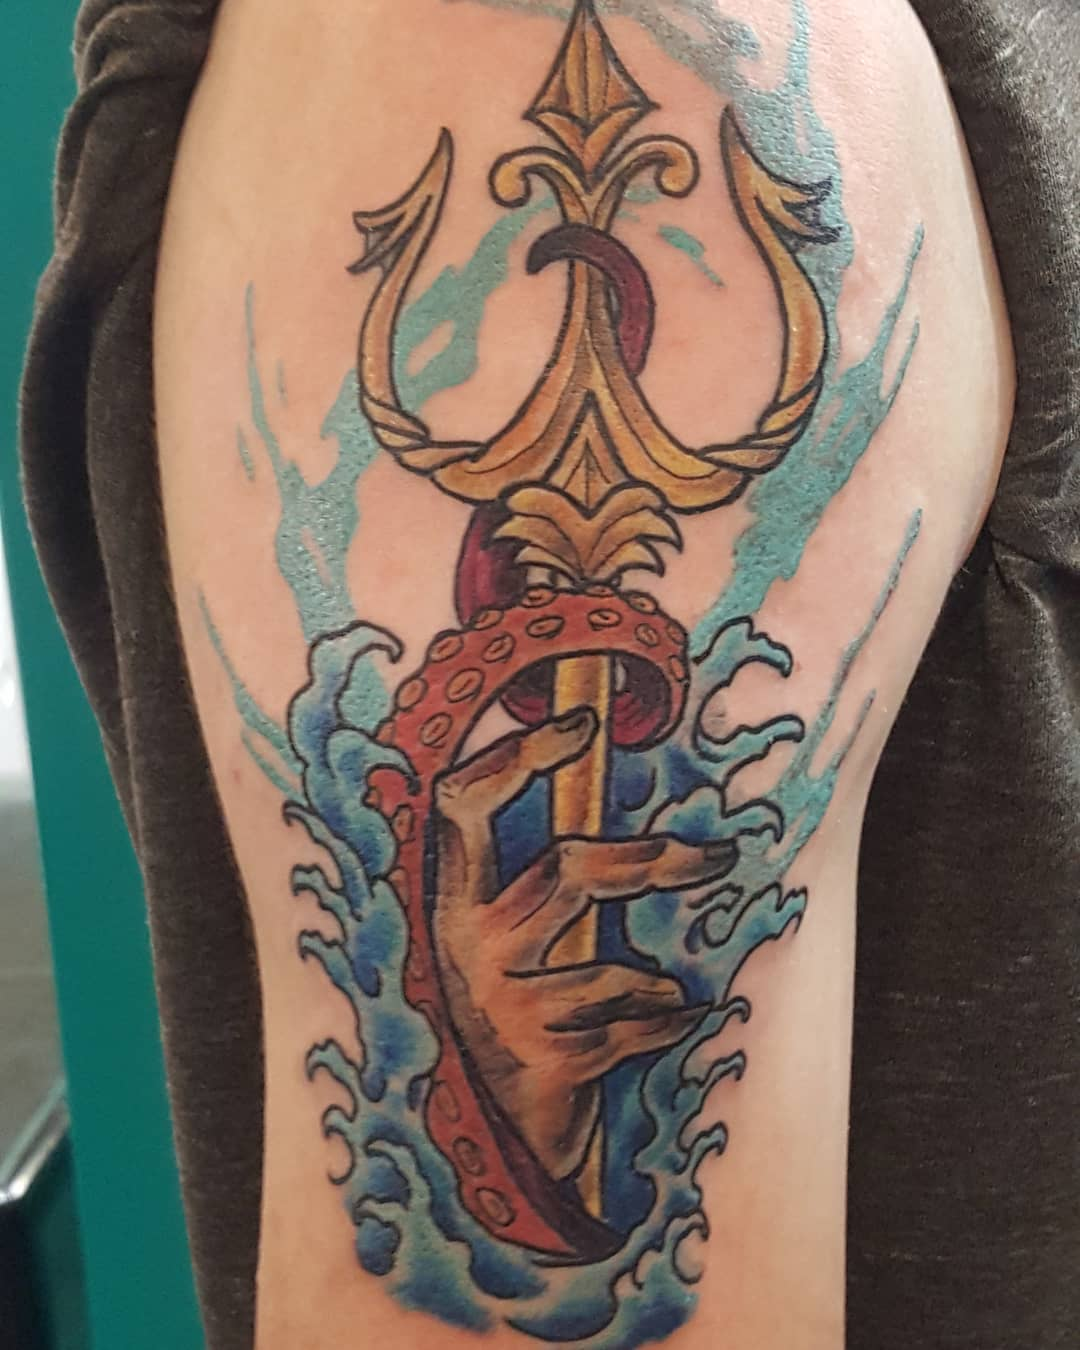 Dennis Yi Adams Enigma Tattoo Piercing Studio Delmar Loop